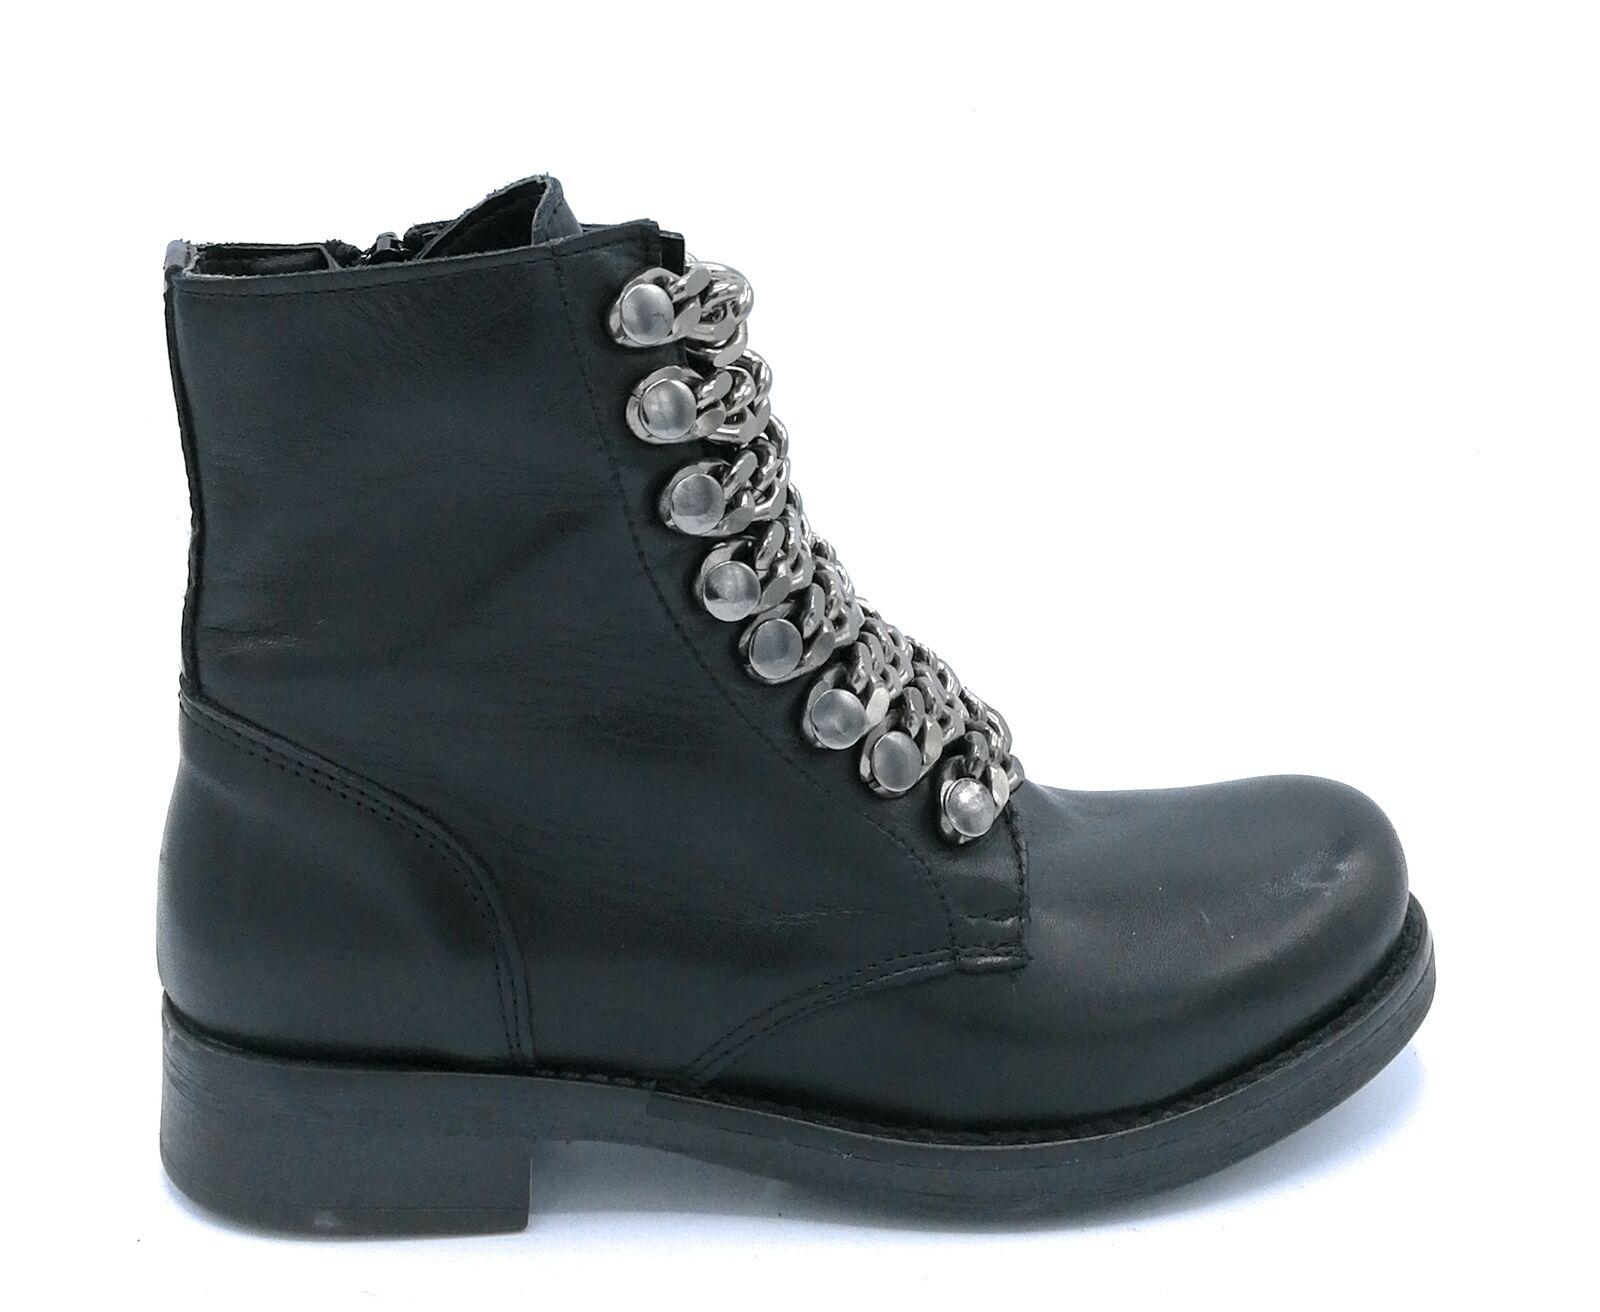 cómodamente Paola Firenze 2100 2100 2100 botas Militares con Cadenas de Cuero Negro Cremallera Fondo  barato